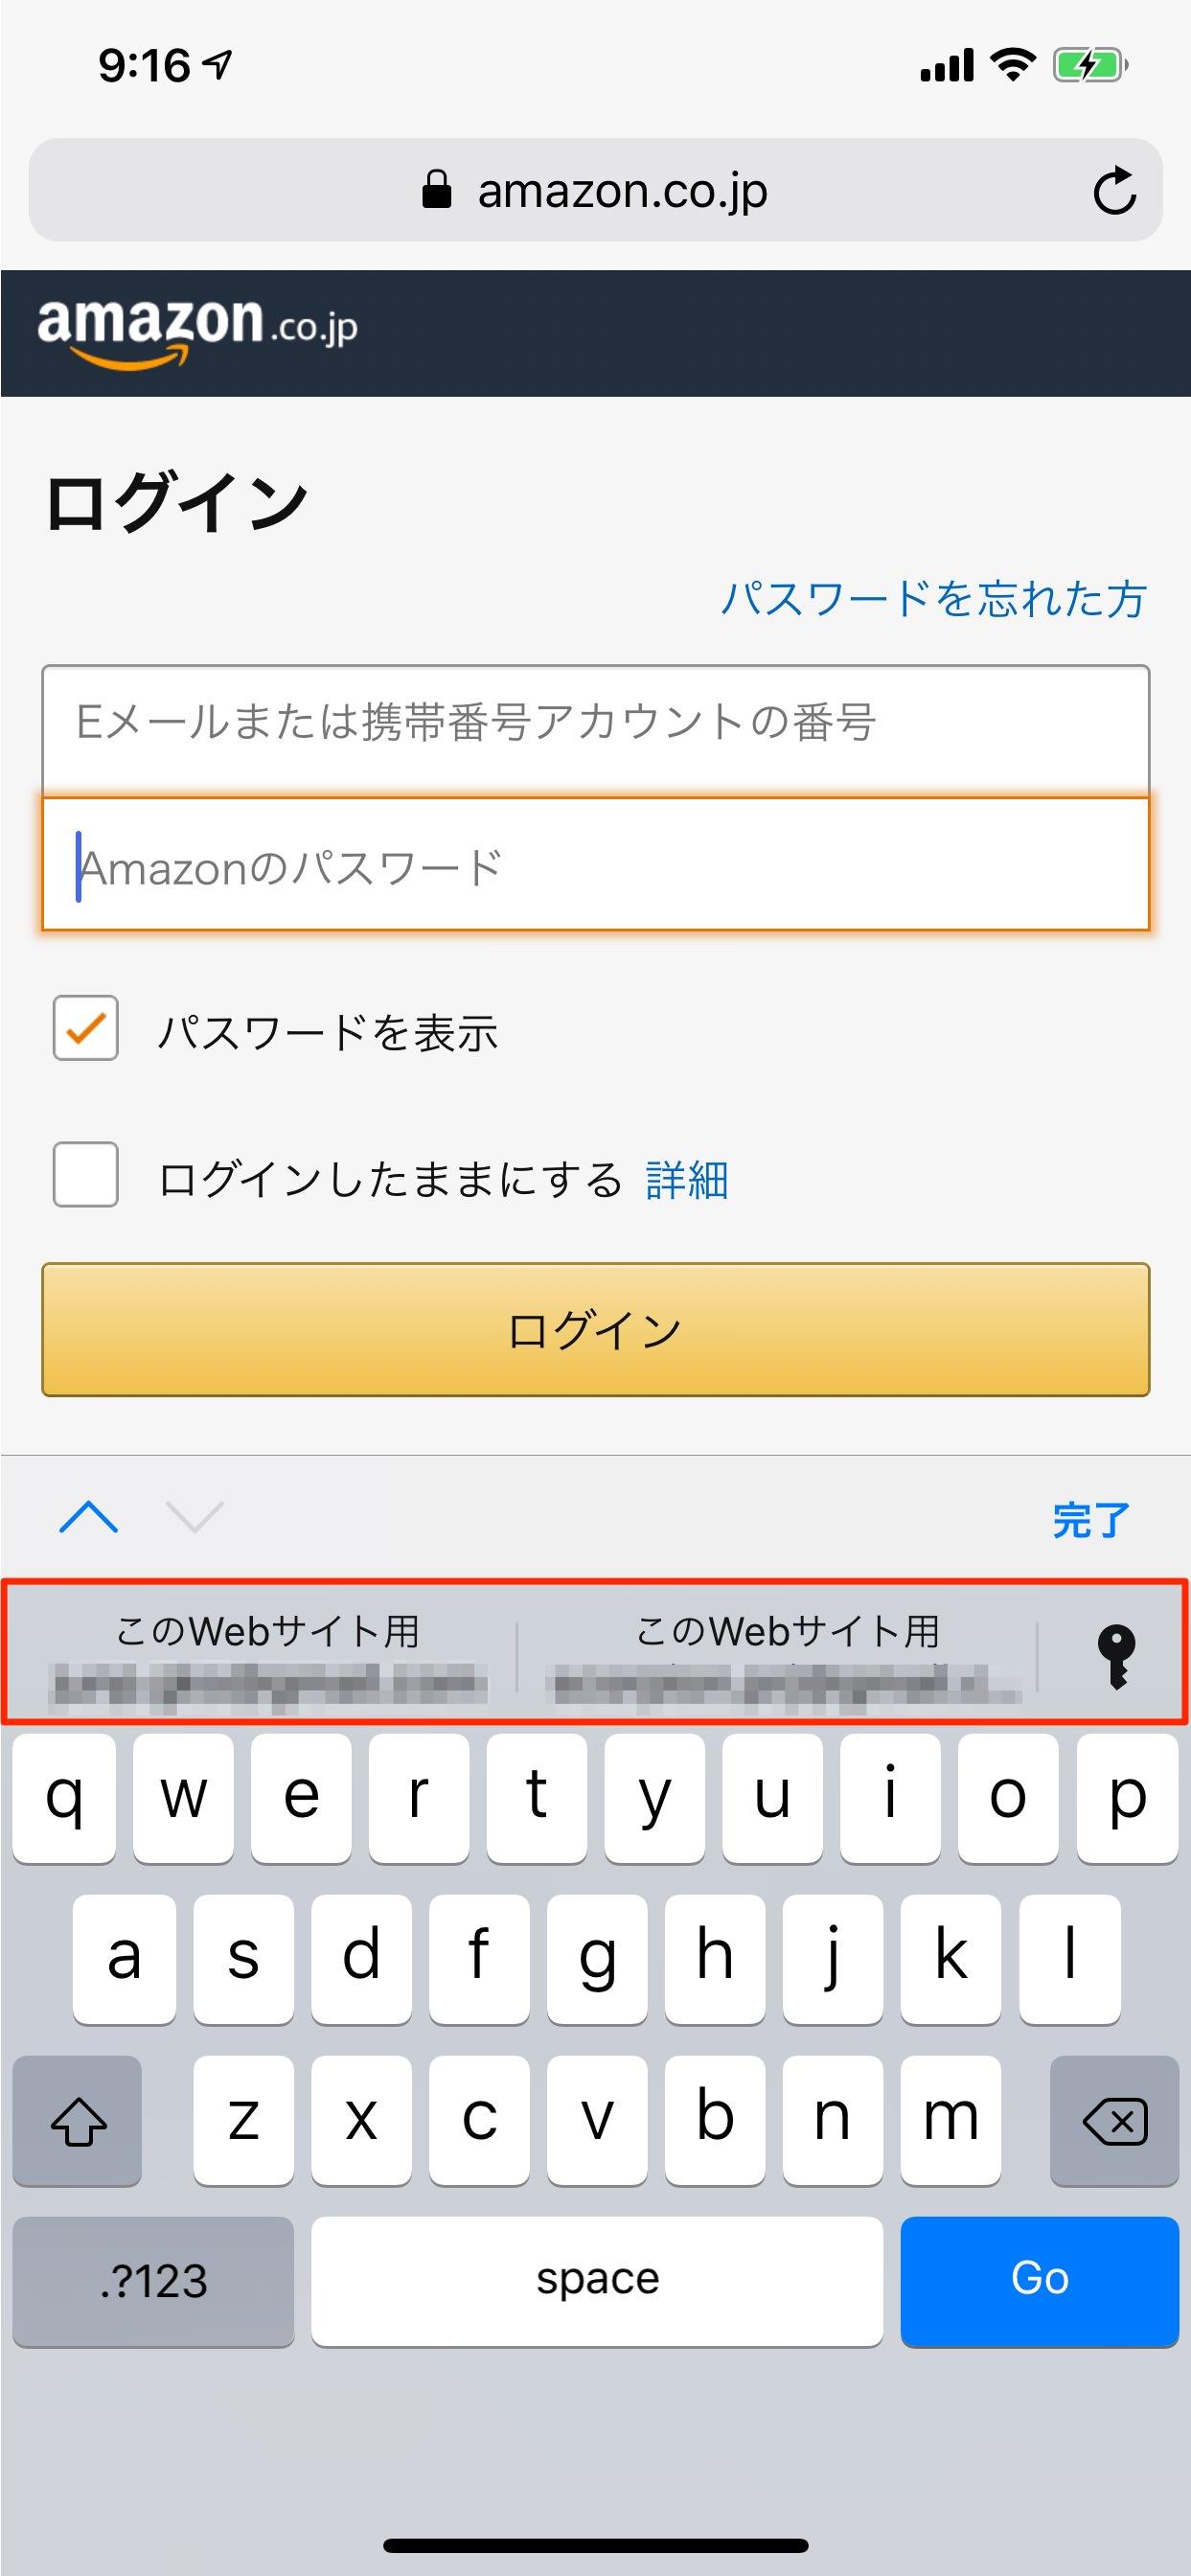 iphoen-automatic-password-input-7